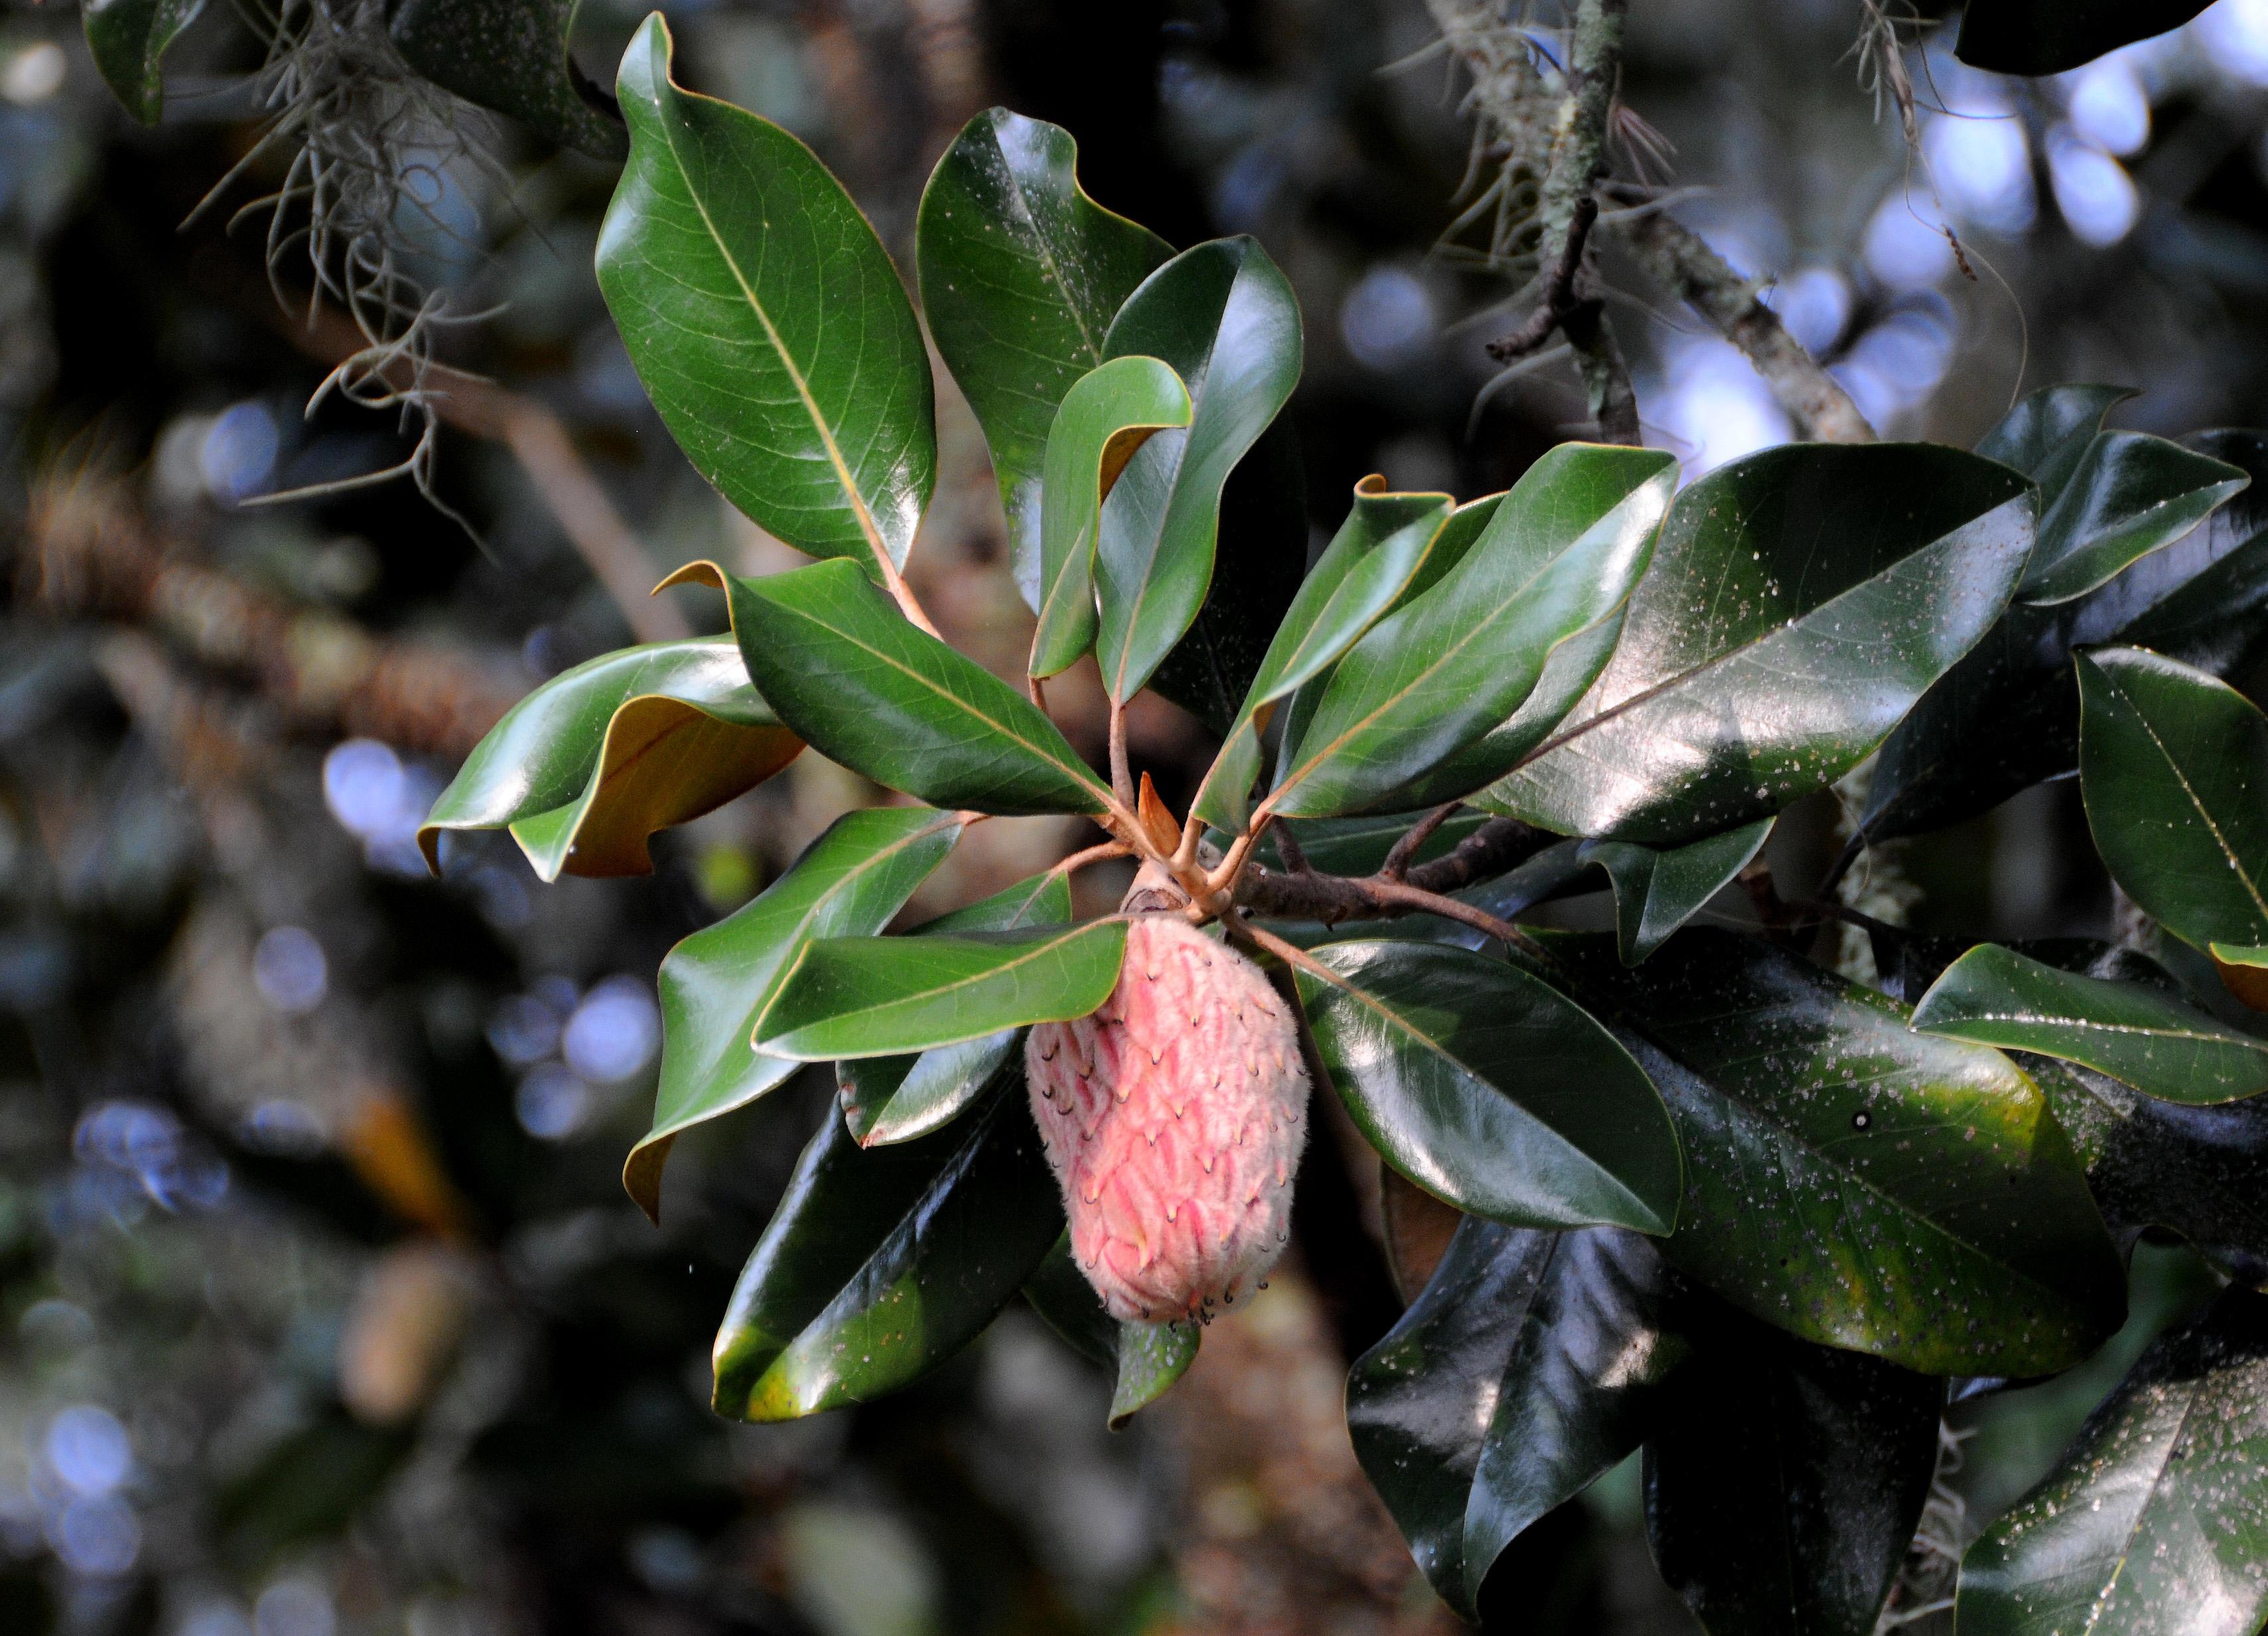 Magnolia Tree Seed Pod Photo Hubert Steed Photos At Pbasecom